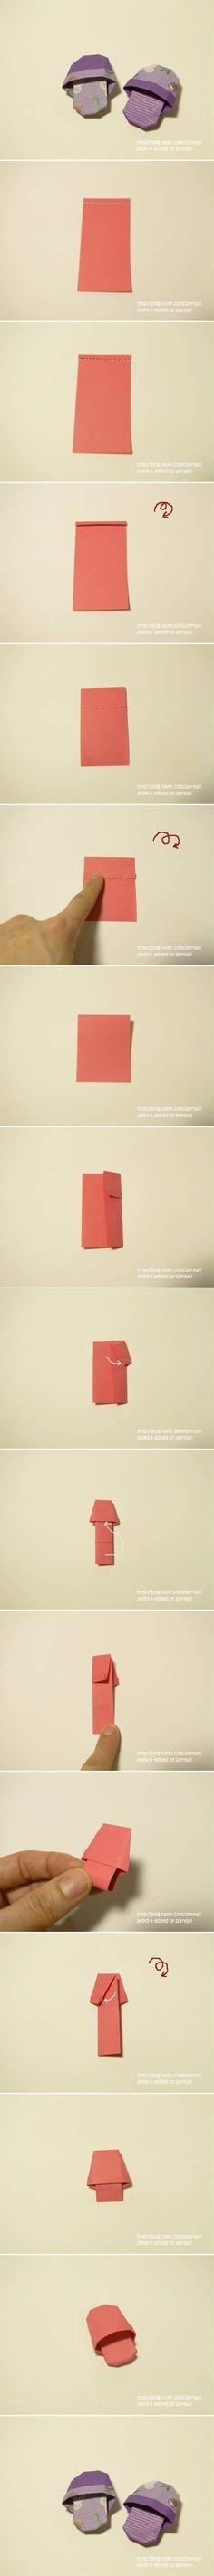 Origami Flip Flops Instructions / Origami Instruction on imgfave Origami Paper Folding, Origami And Quilling, Origami Envelope, Origami And Kirigami, Origami Heart, Paper Crafts Origami, Origami Box, Origami Dress, Money Origami